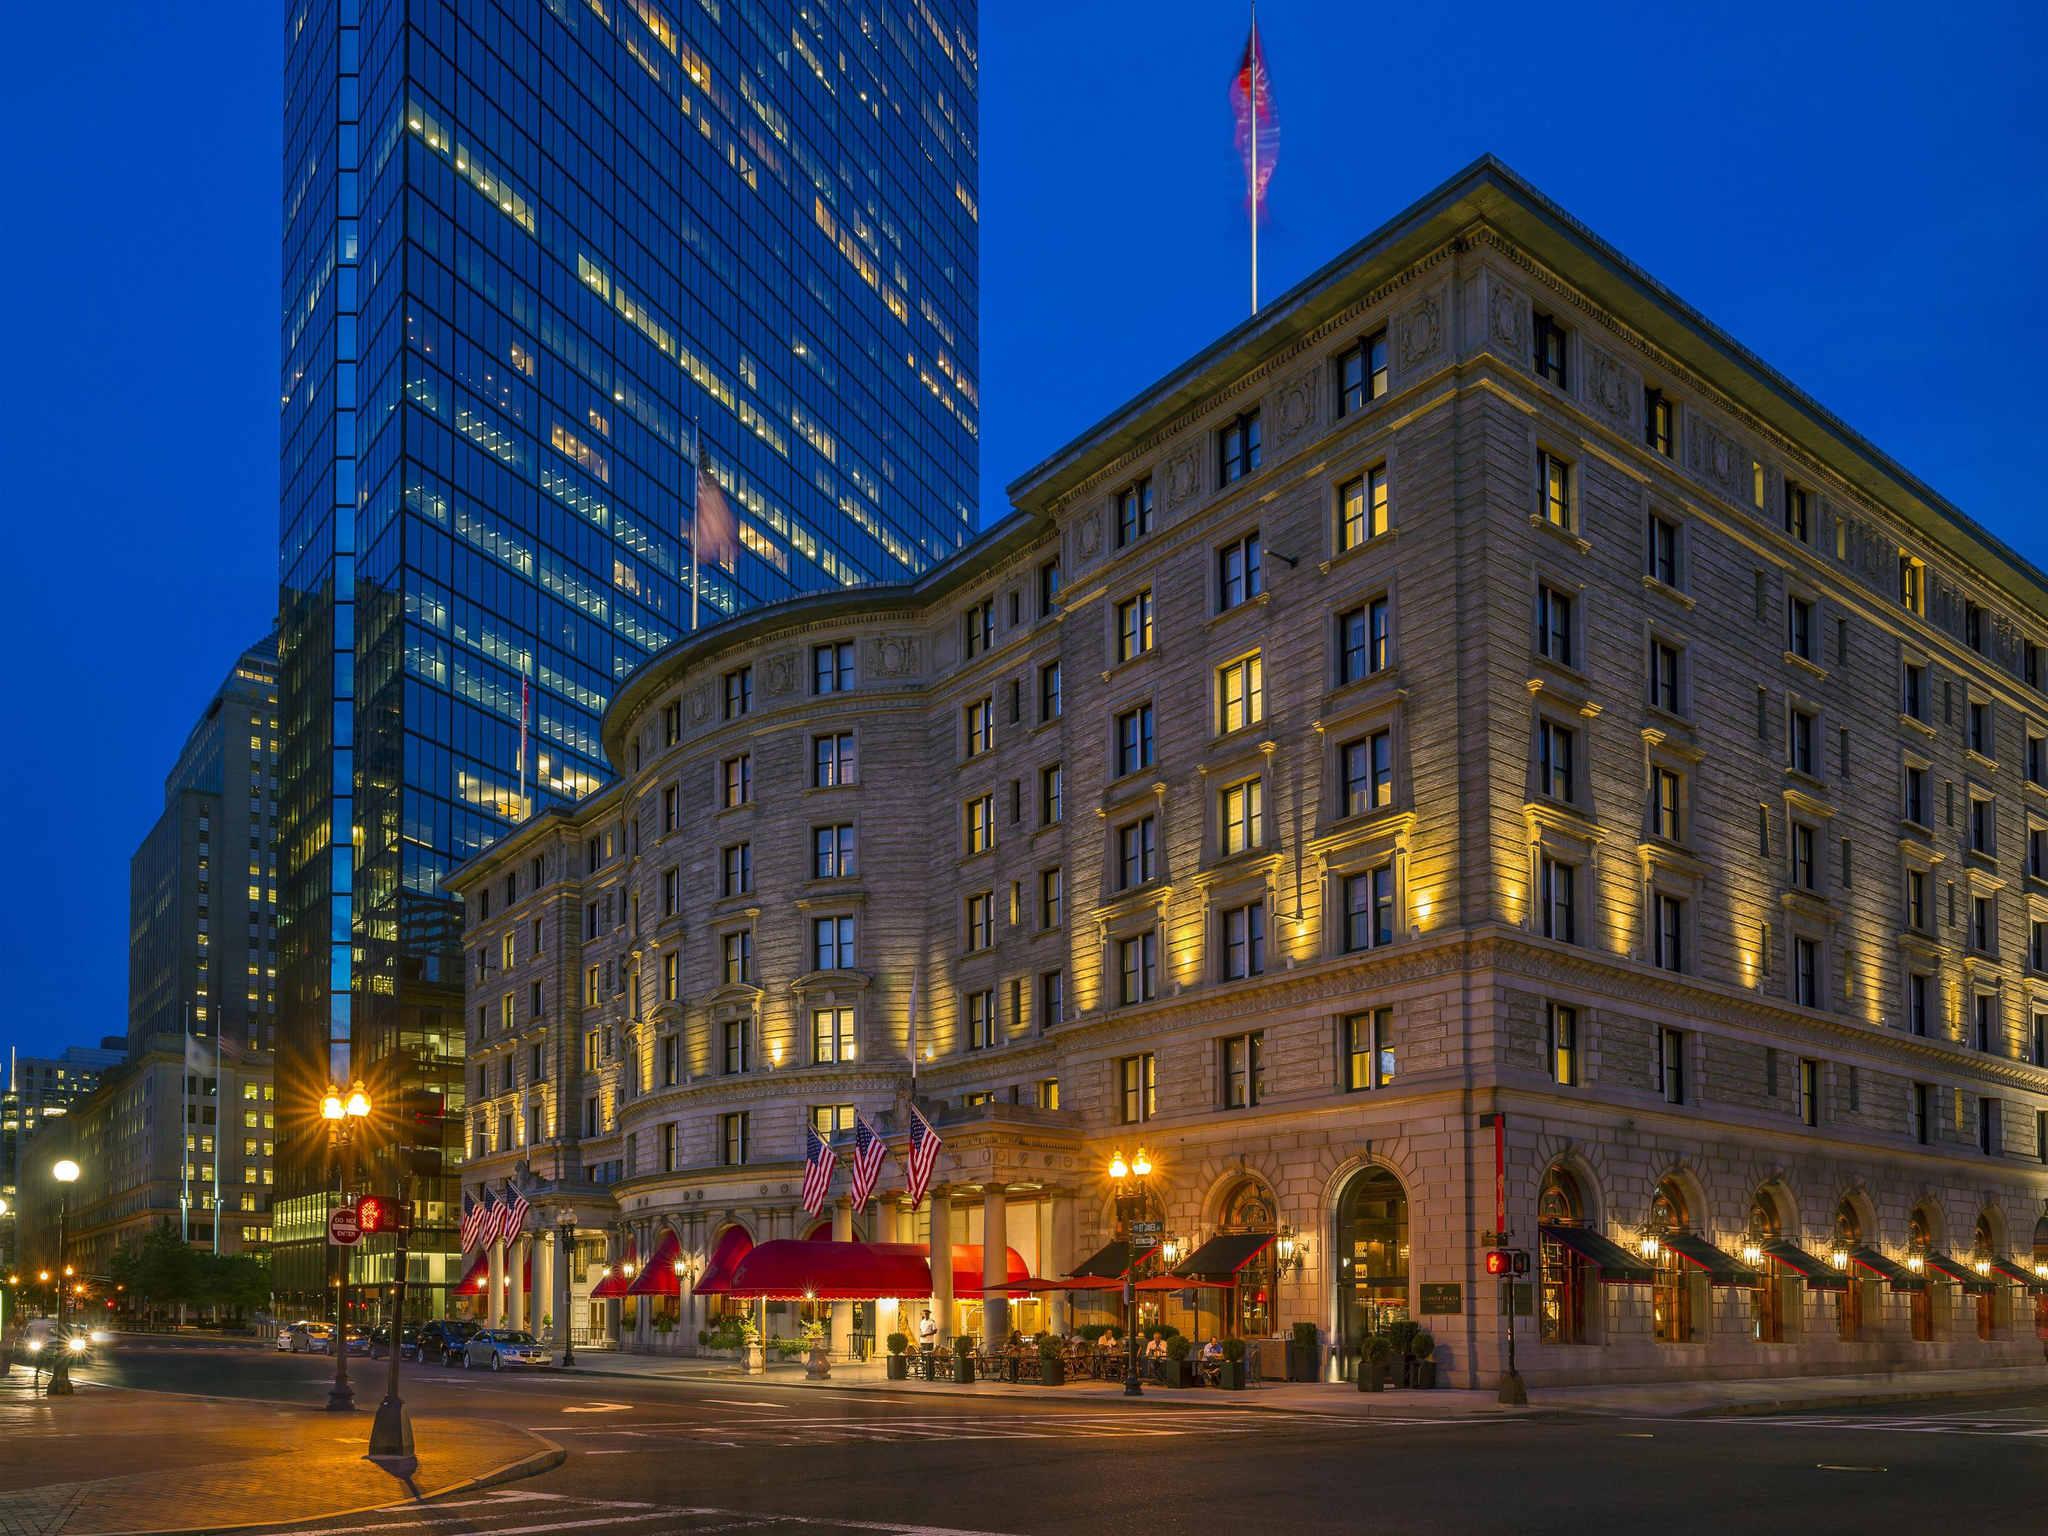 Hotel - Fairmont Copley Plaza